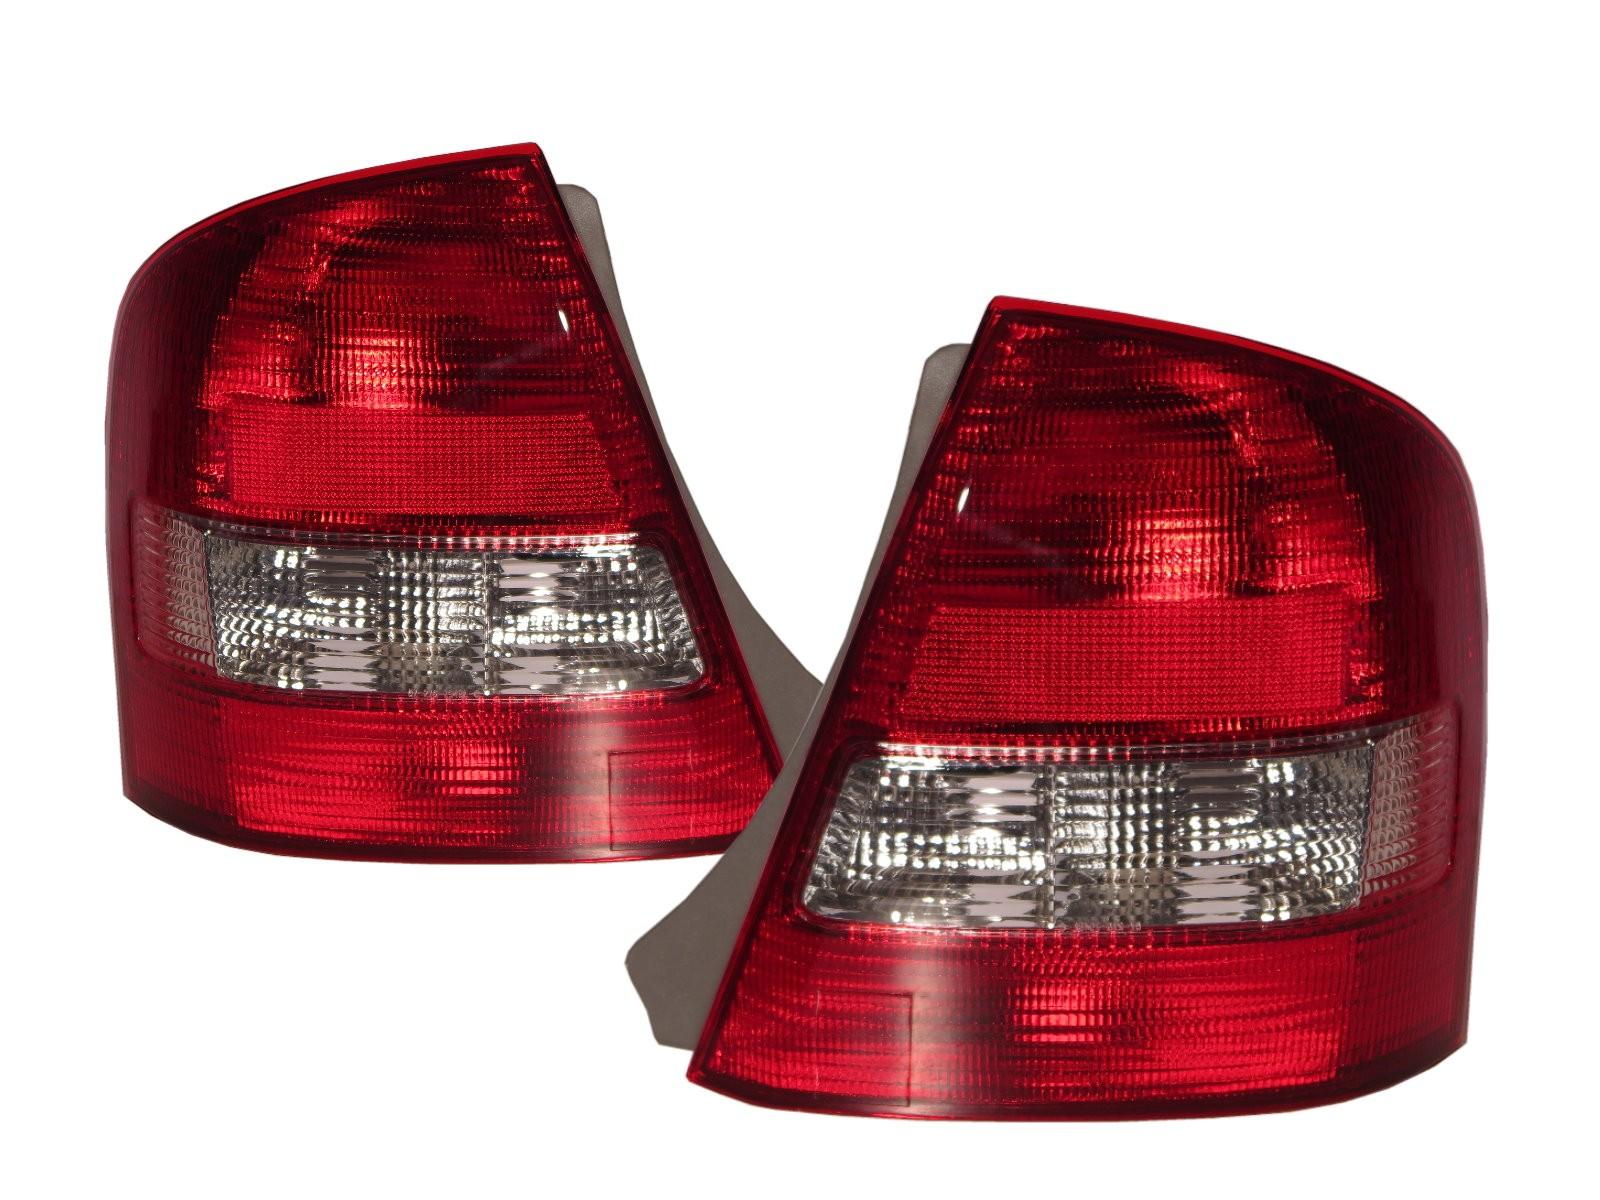 CrazyTheGod Familia BJ Eighth generation 1998-2004 Sedan 4D Clear Tail Rear Light Red/White V4 for MAZDA